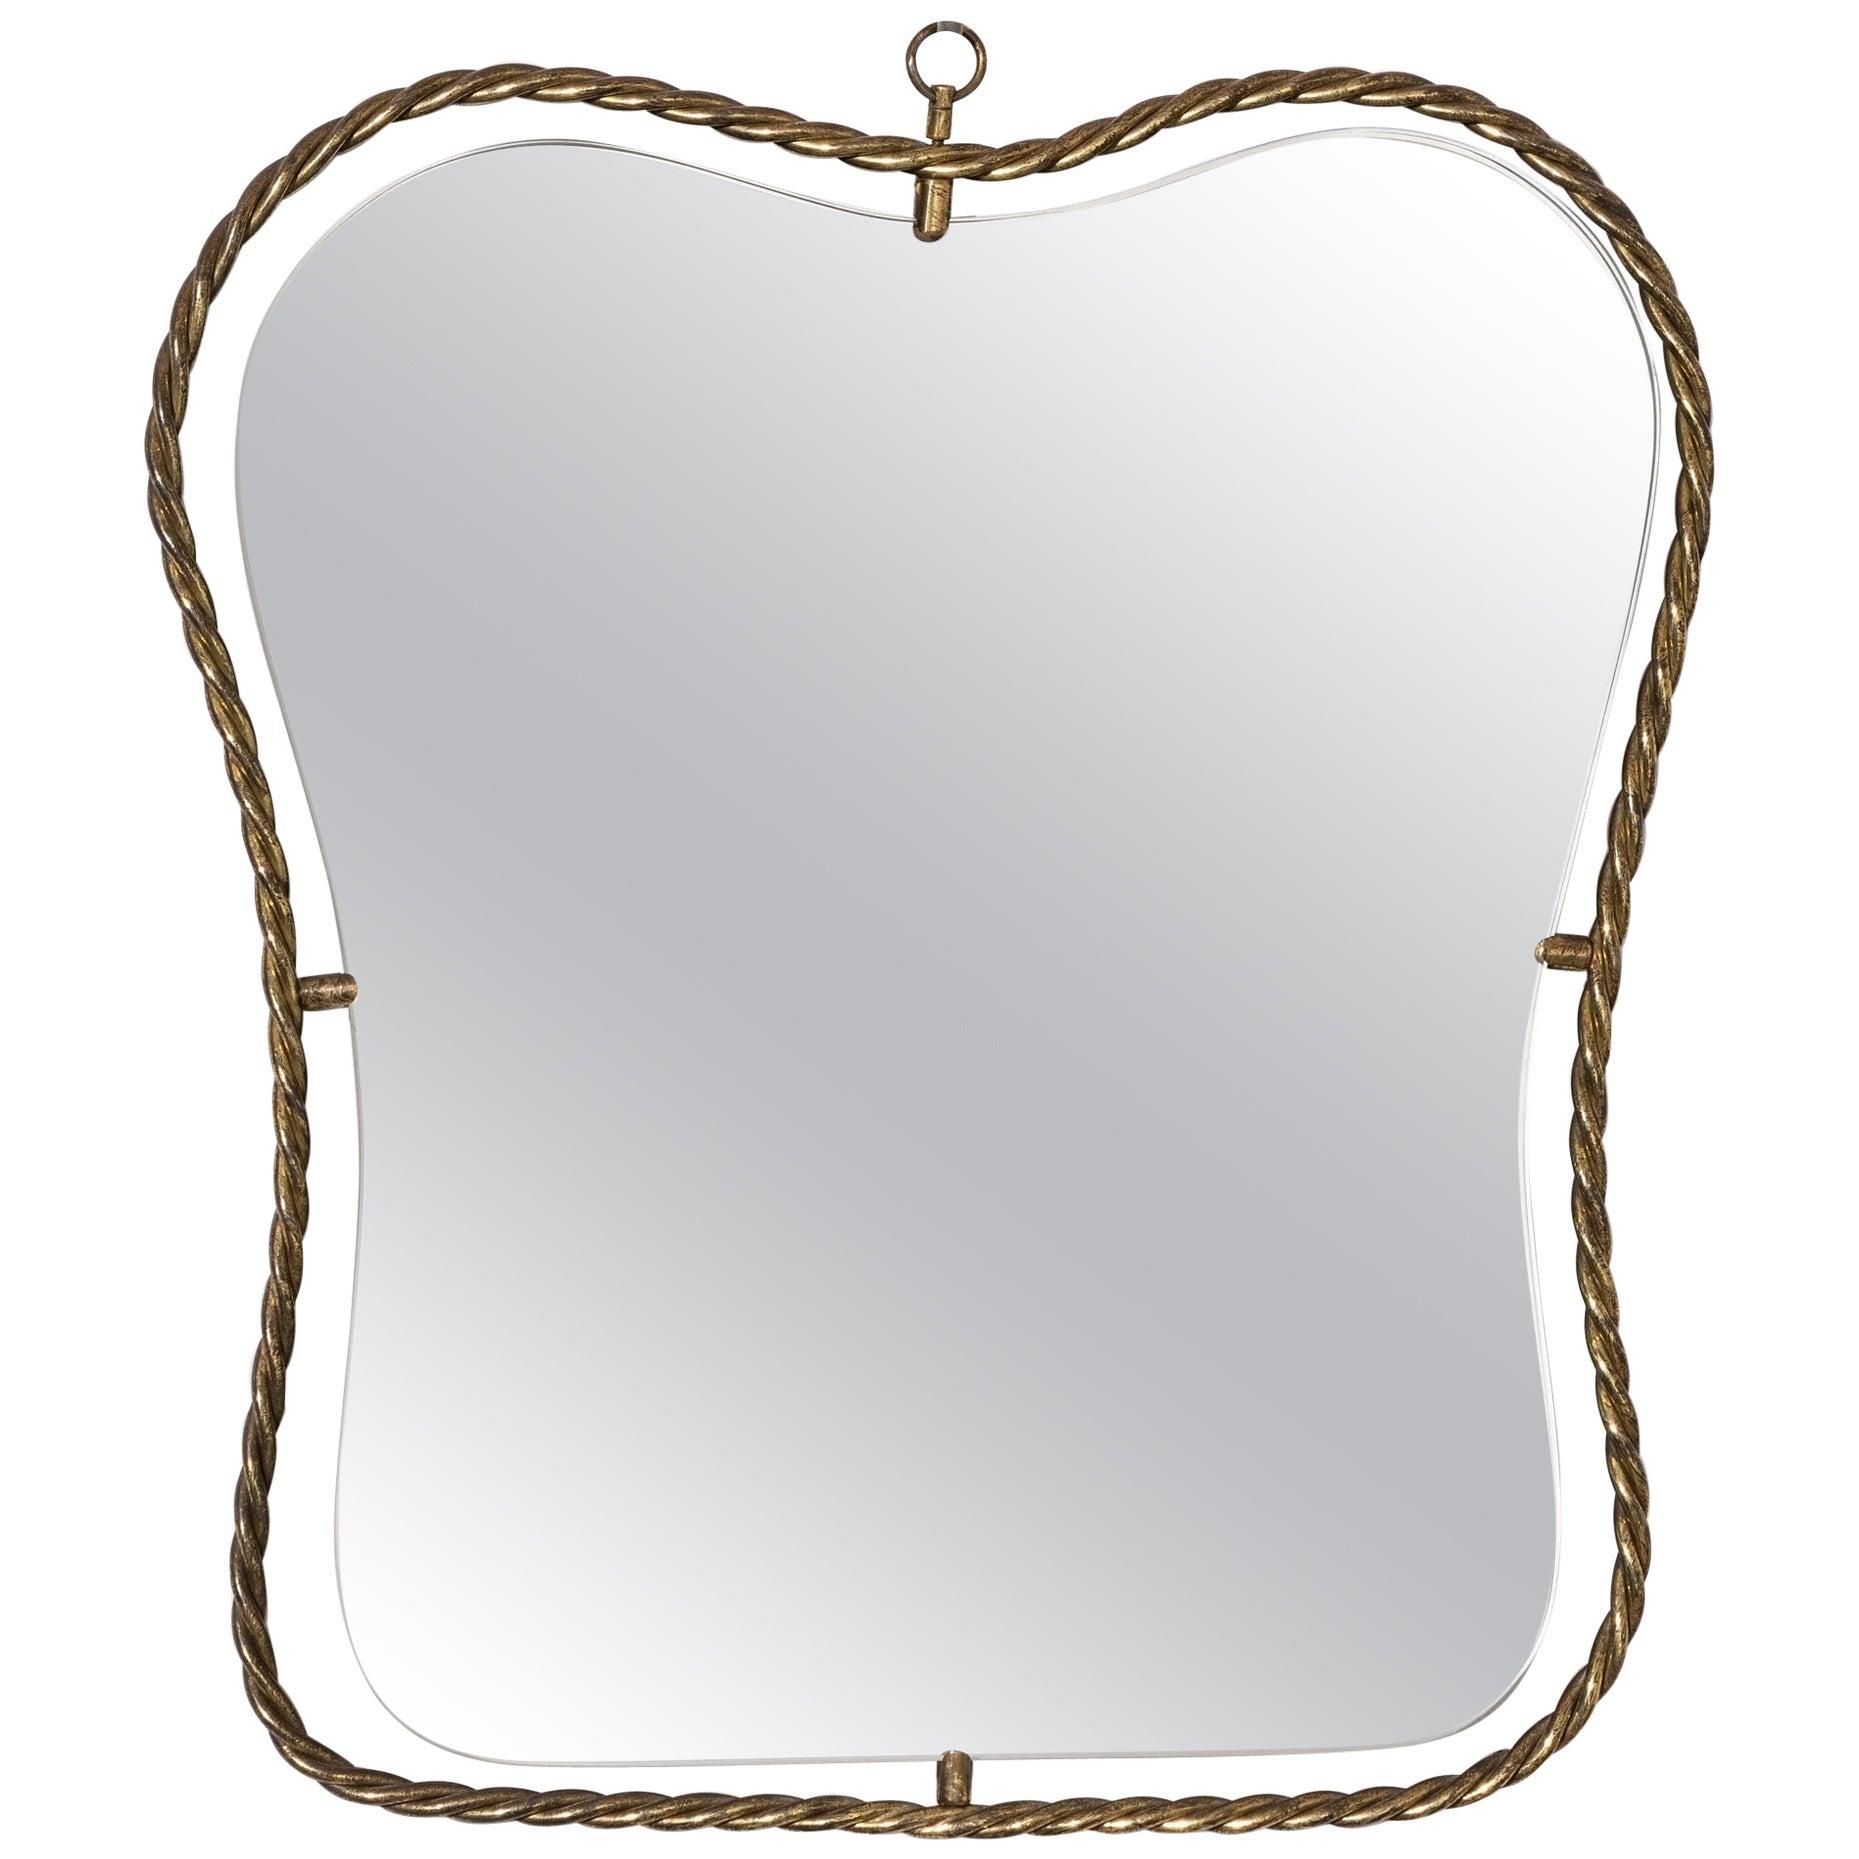 Italian, Small Organic Wall Mirror, Brass, Mirror Glass, Italy, 1950s